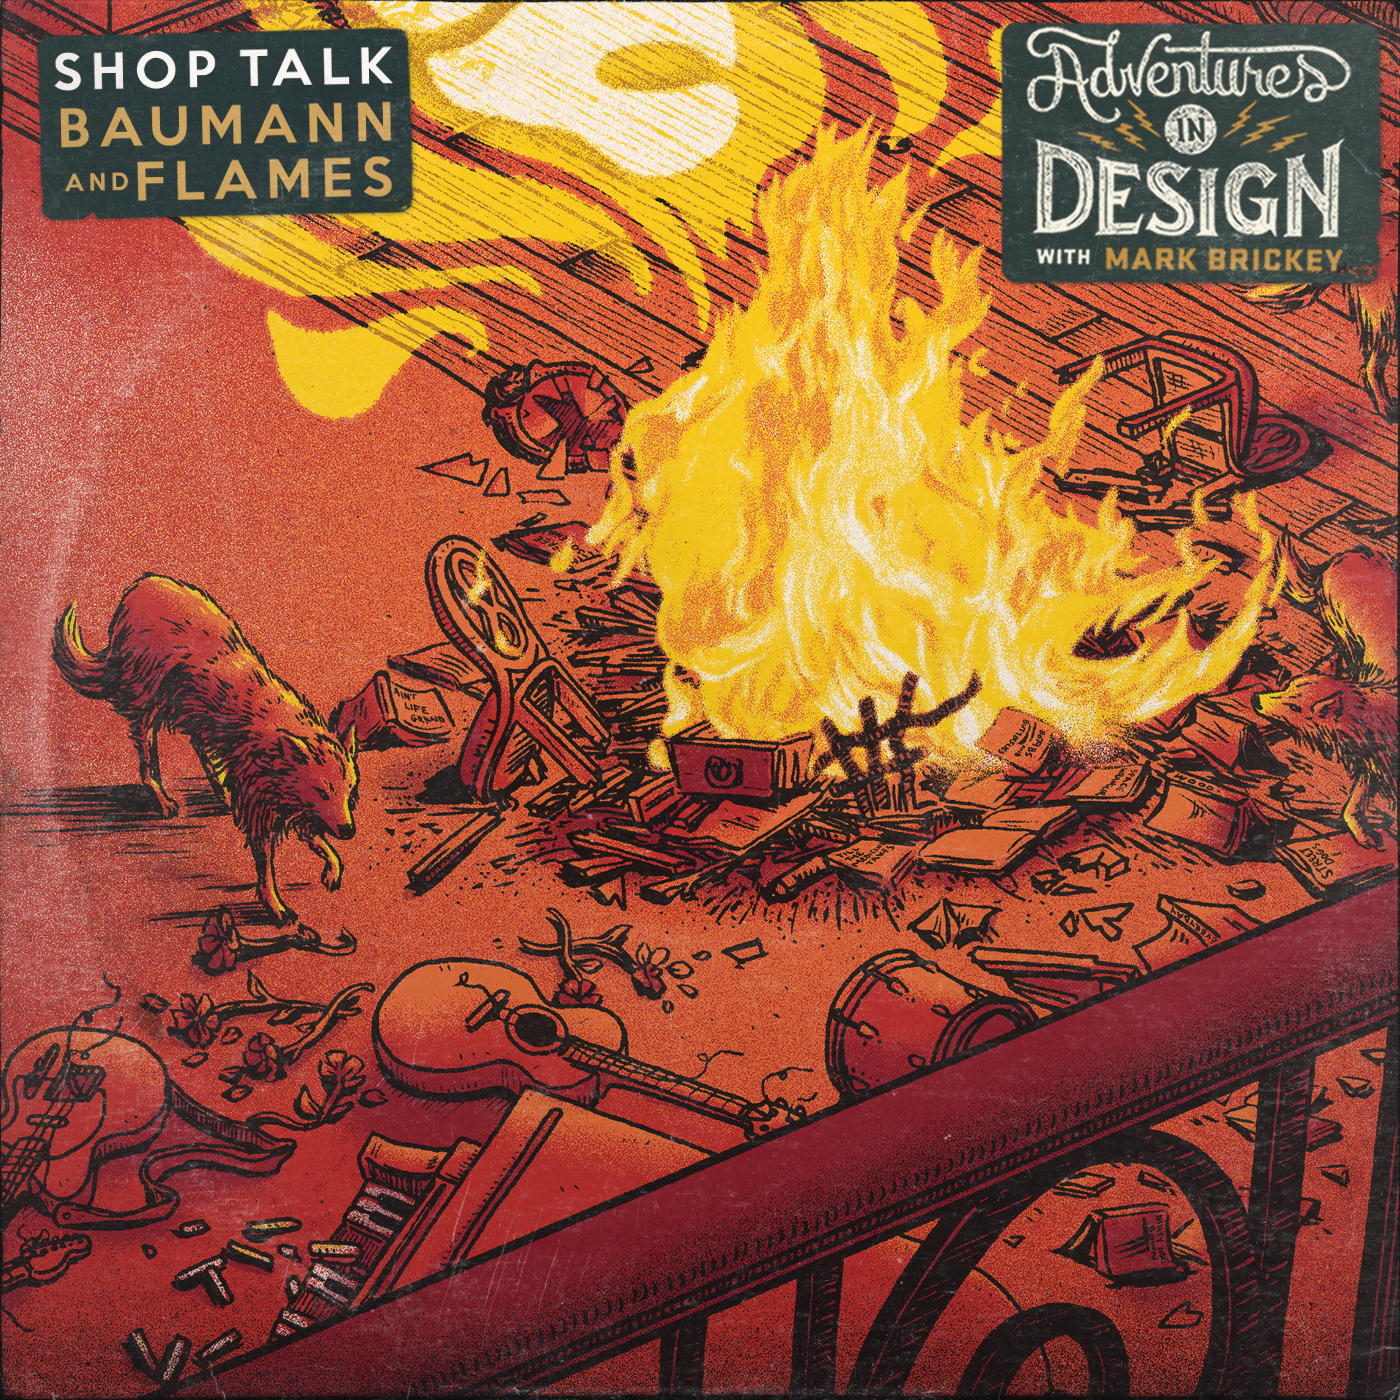 Episode 324 - Shop Talk with Billy Baumann and James Flames